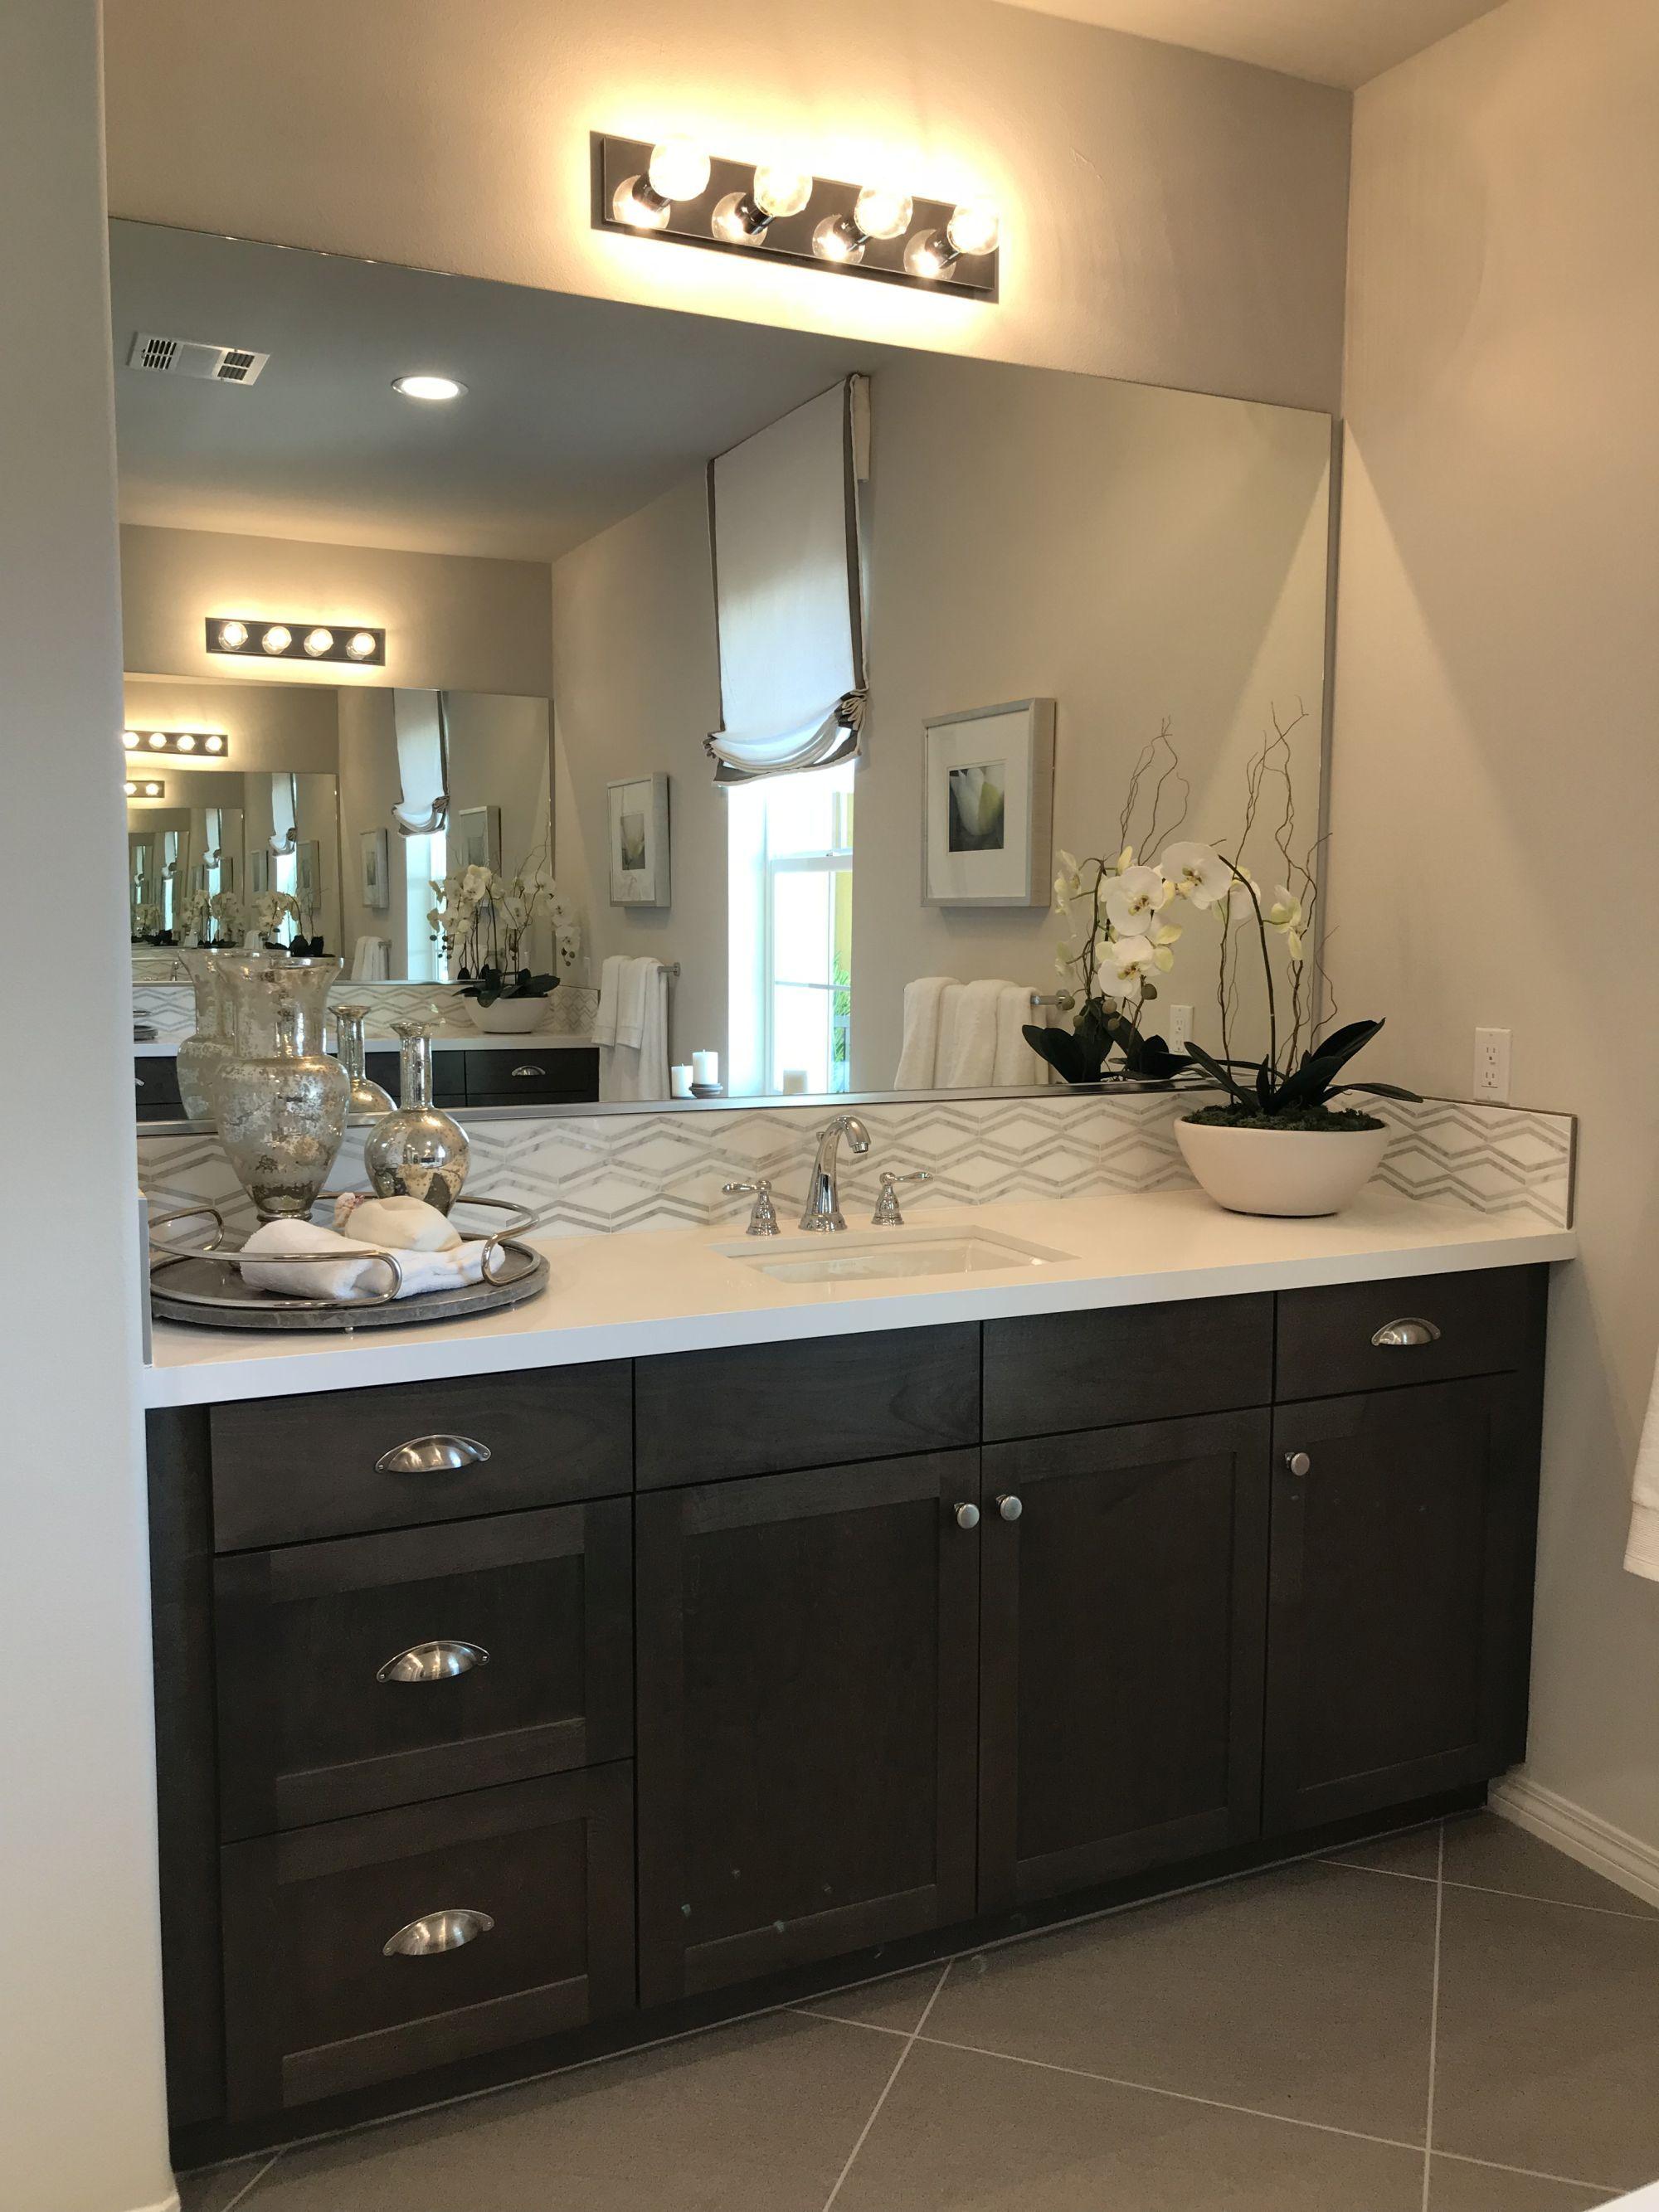 Bathroom Remodel Ideas Black Cabinets White Quartz Countertop Gray Tile Flooring Bathrooms Idea